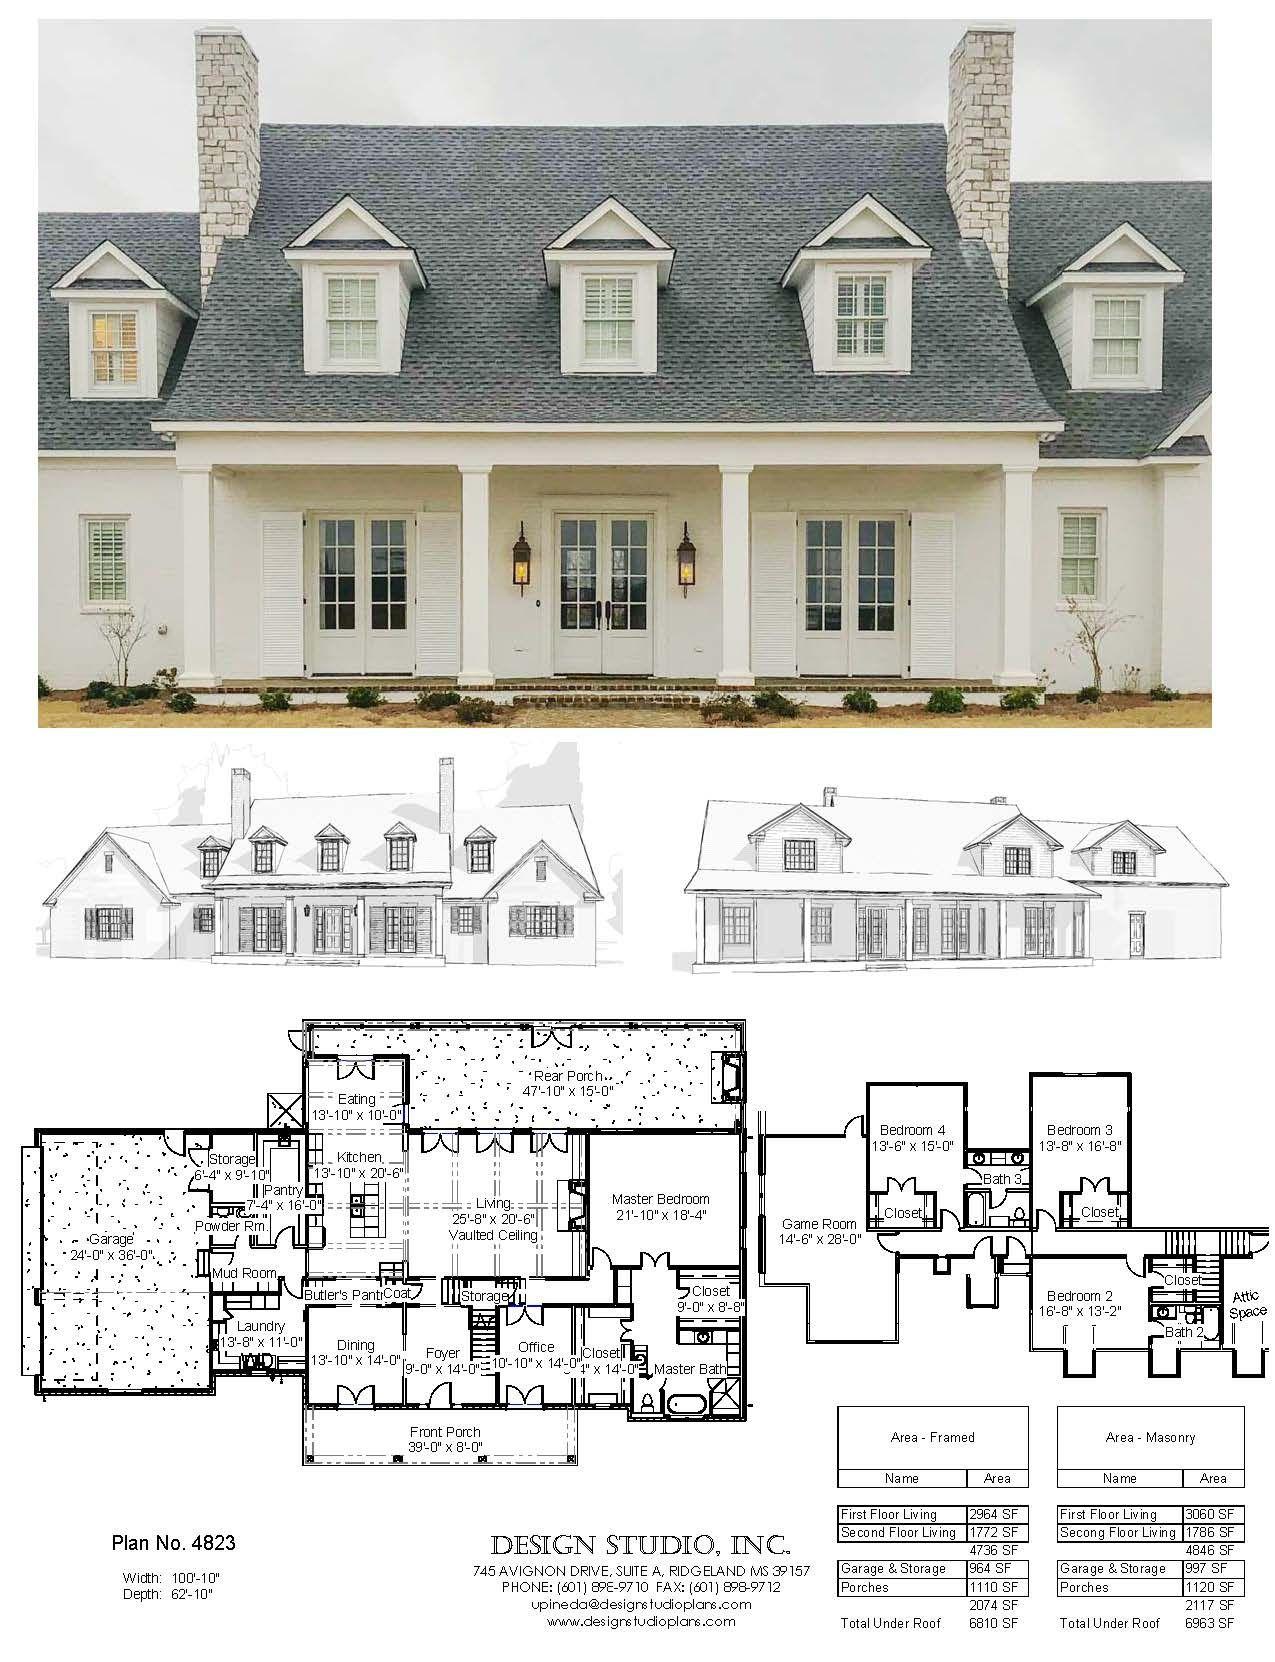 Plan 4823 Design Studio In 2020 Dream House Plans House Plans Architecture House